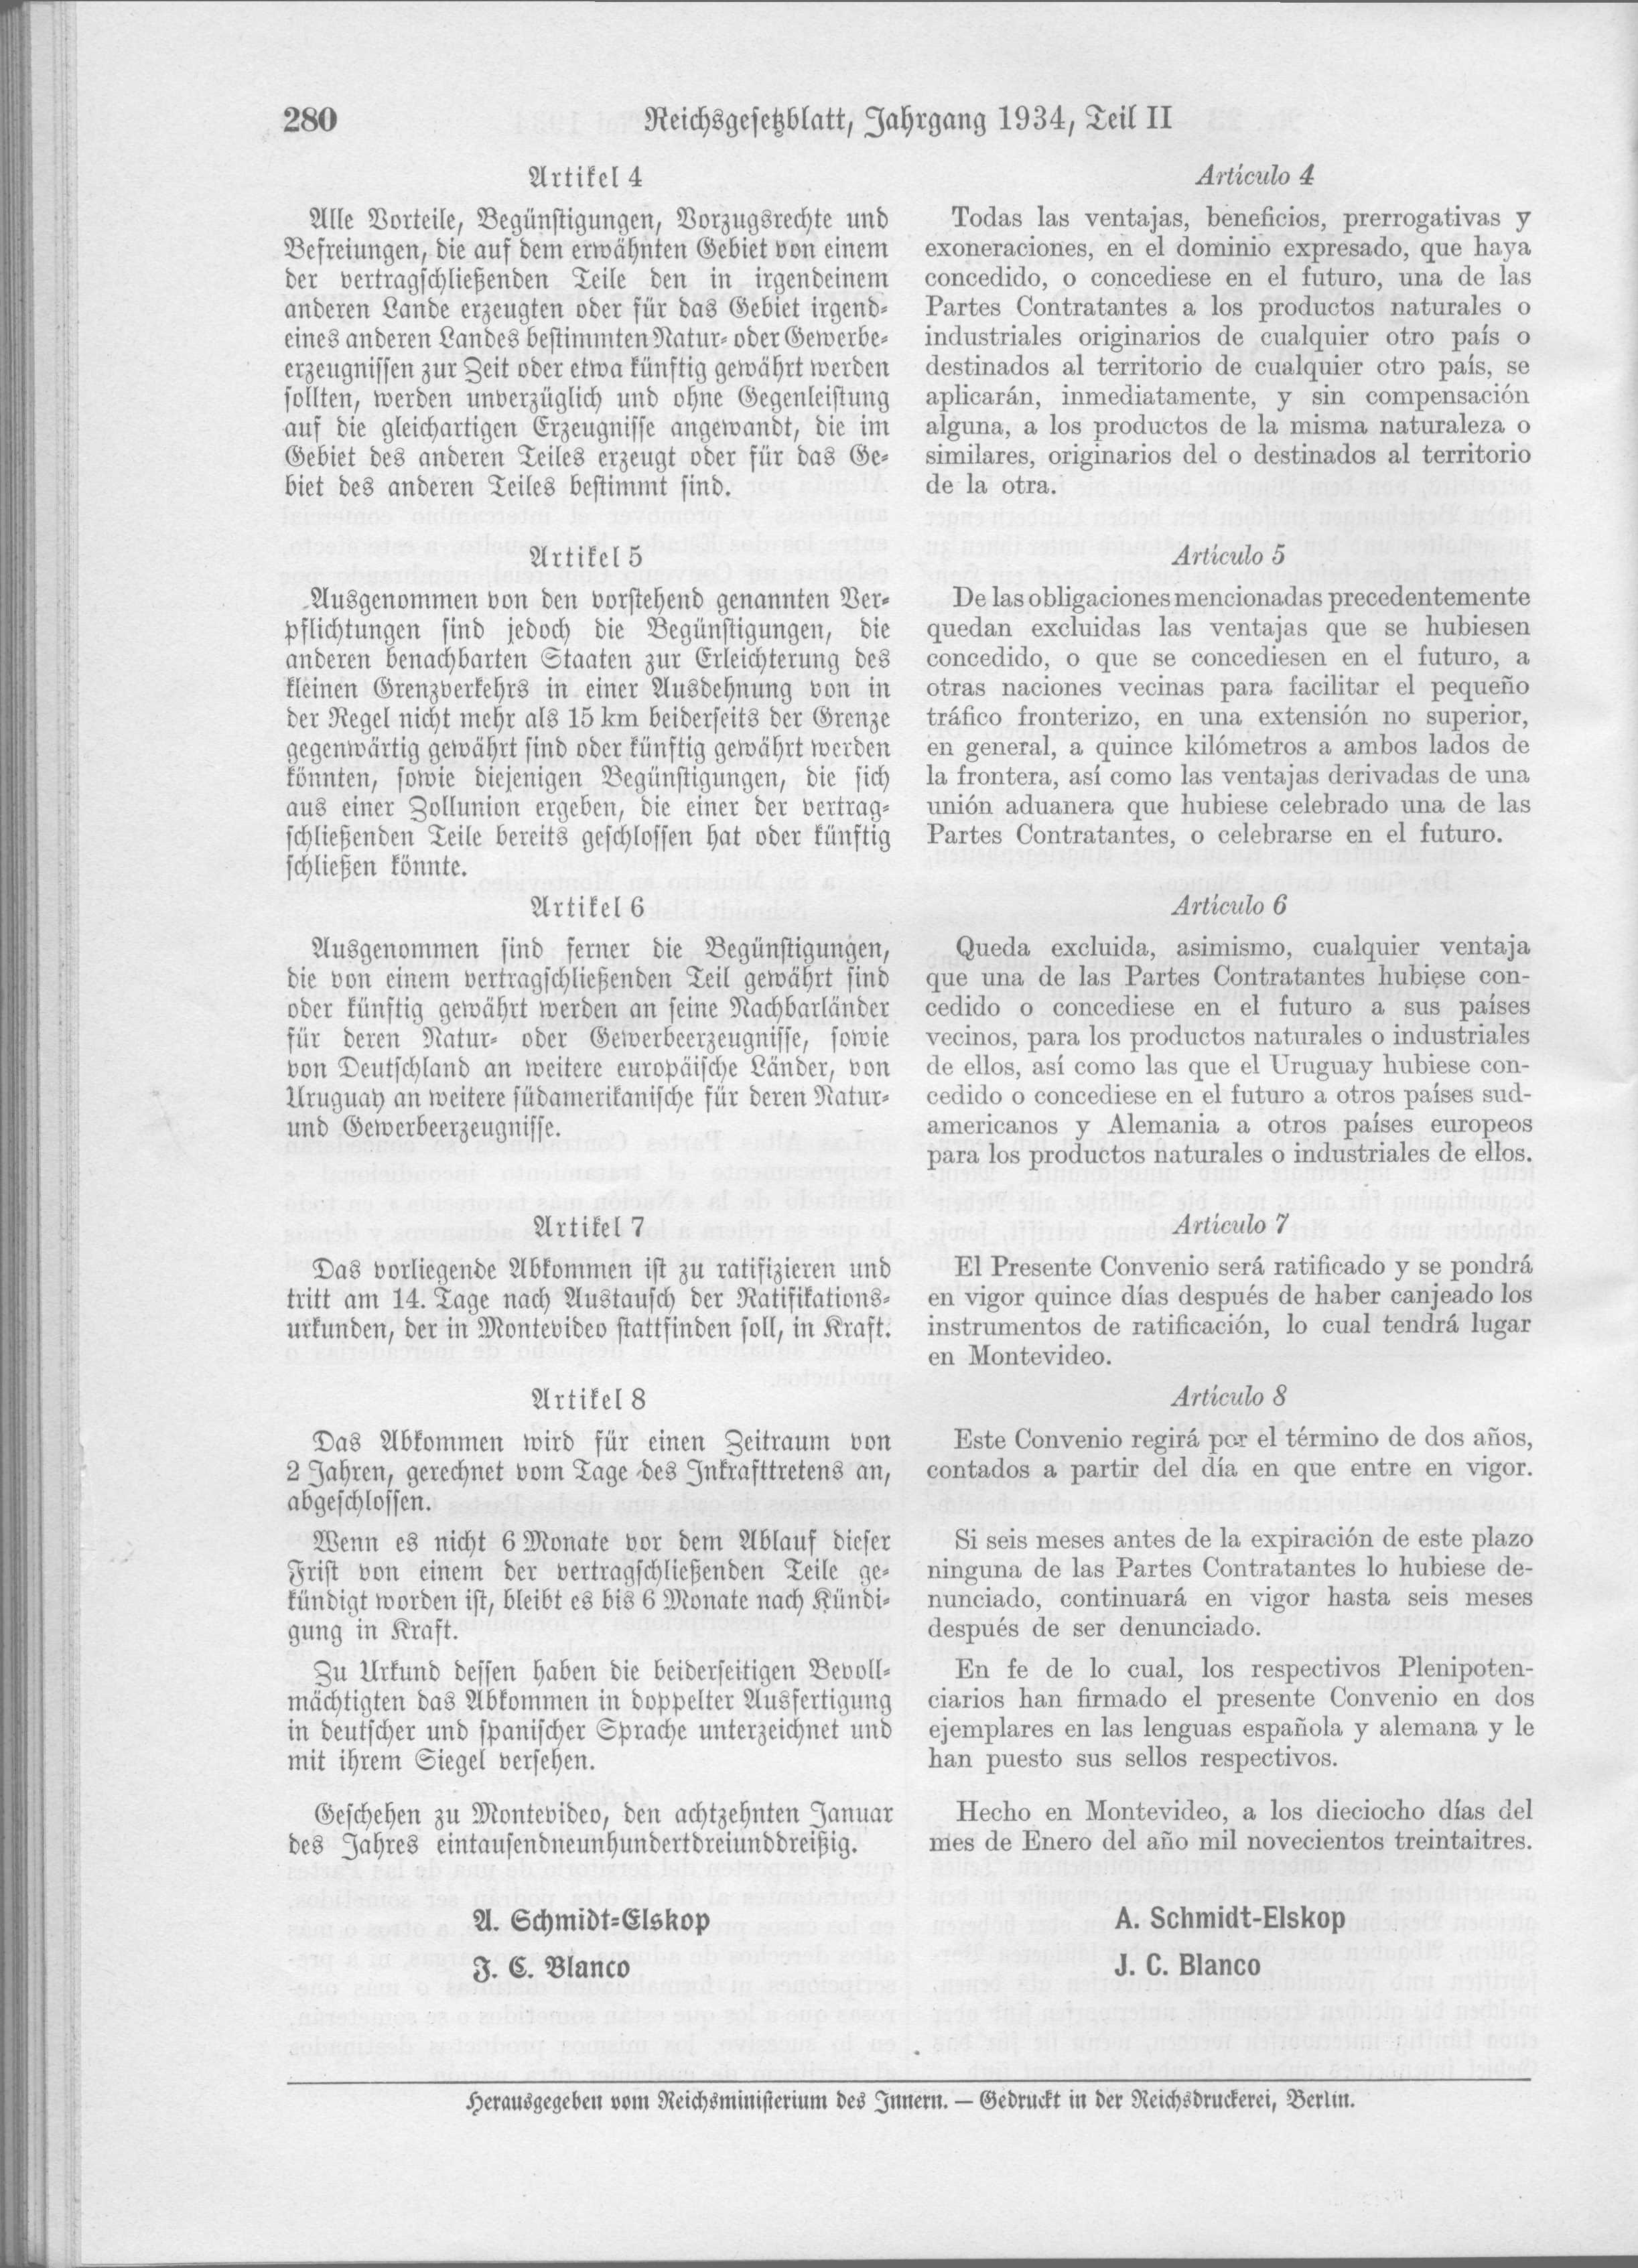 Antes La Vecina file:deutsches reichsgesetzblatt 34t2 023 0280